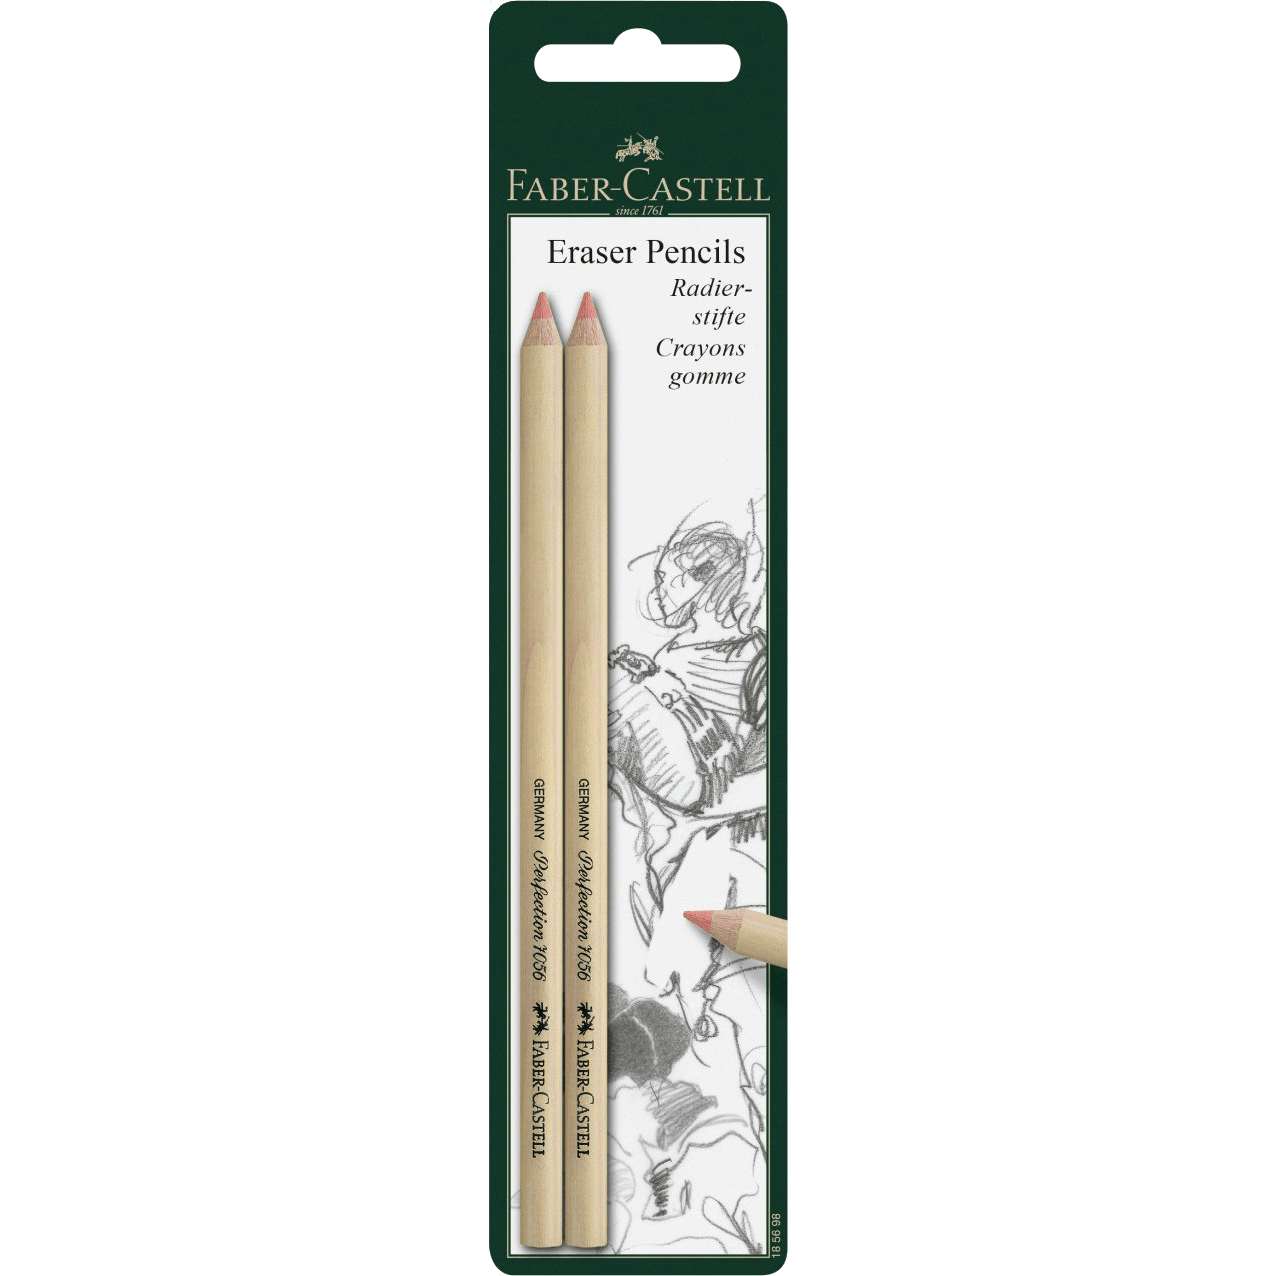 Faber-cCastell eraser pencil